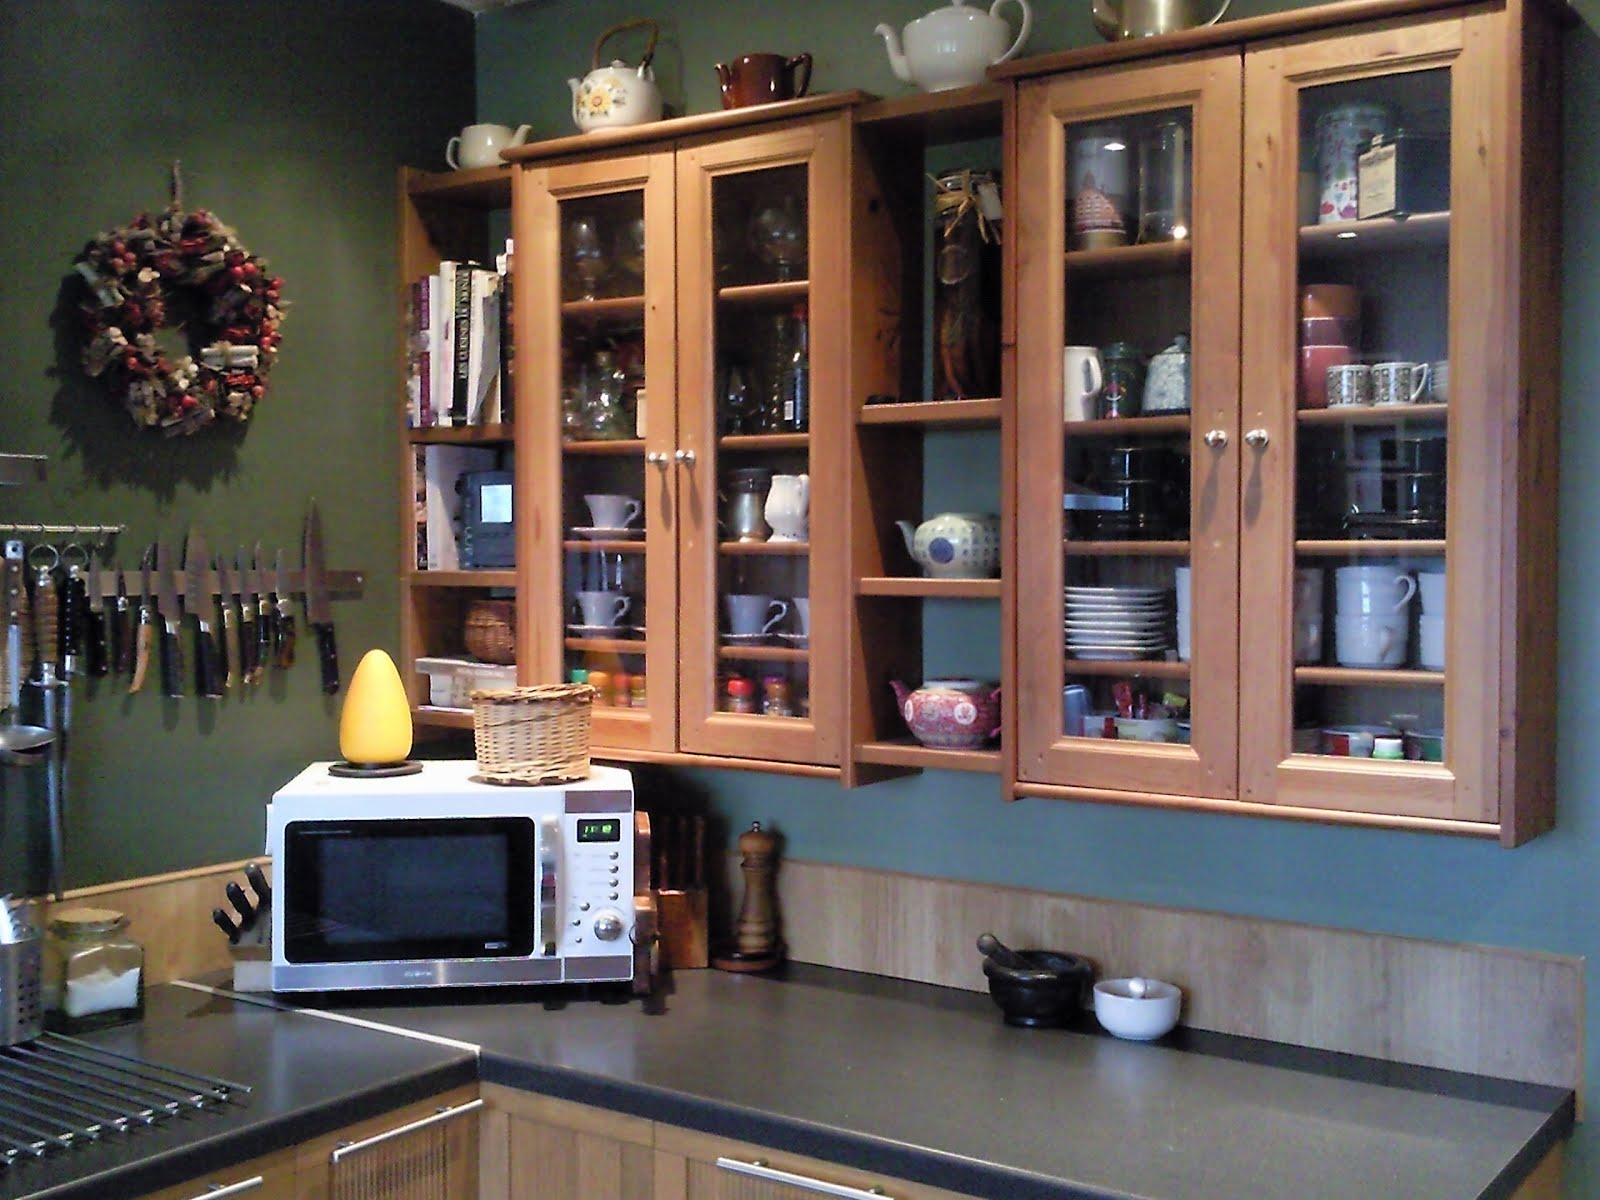 Leksvik Pine Cd Cabinets And Ikea Pine Shelves Kitchen Cabinets Ikea Hackers